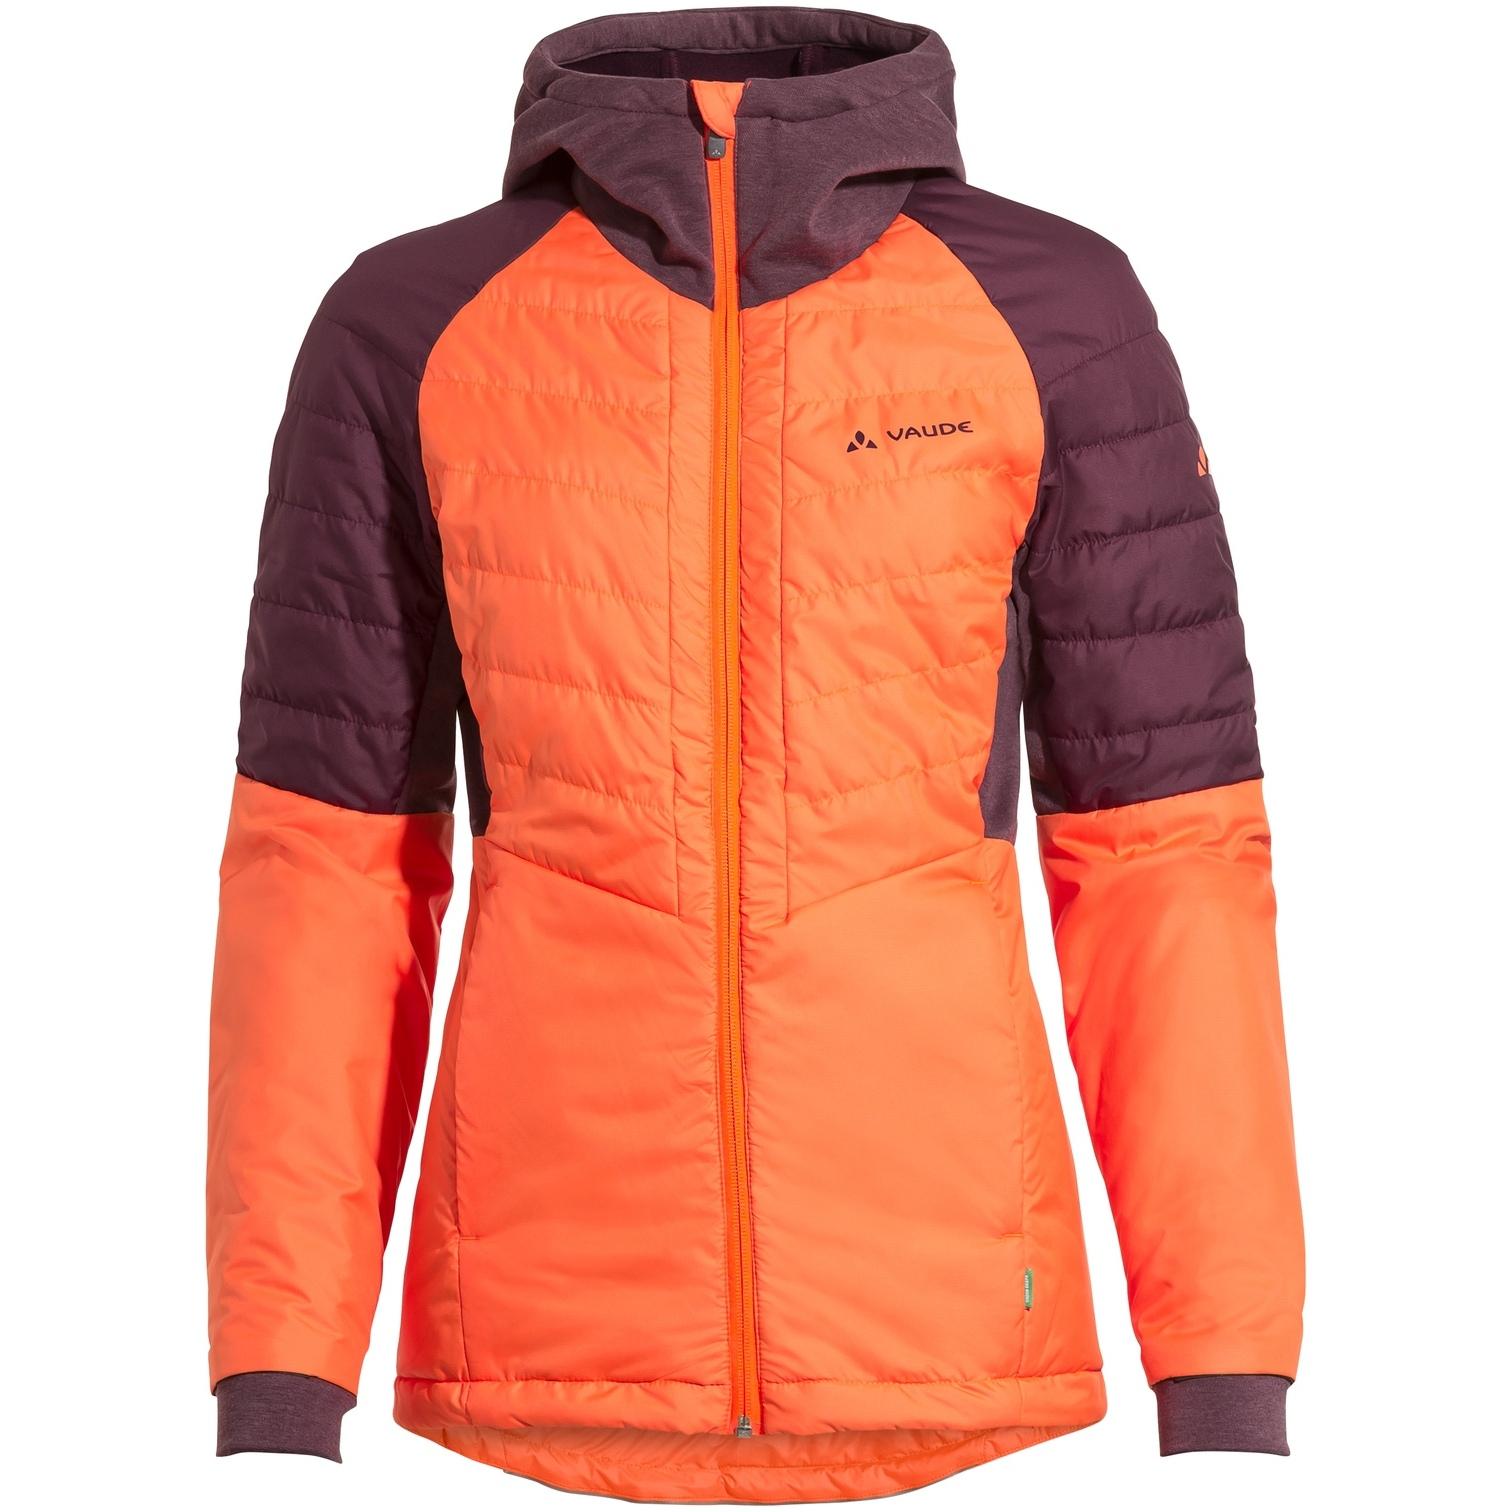 Image of Vaude Women's Cyclist Hybrid Jacket - neon orange